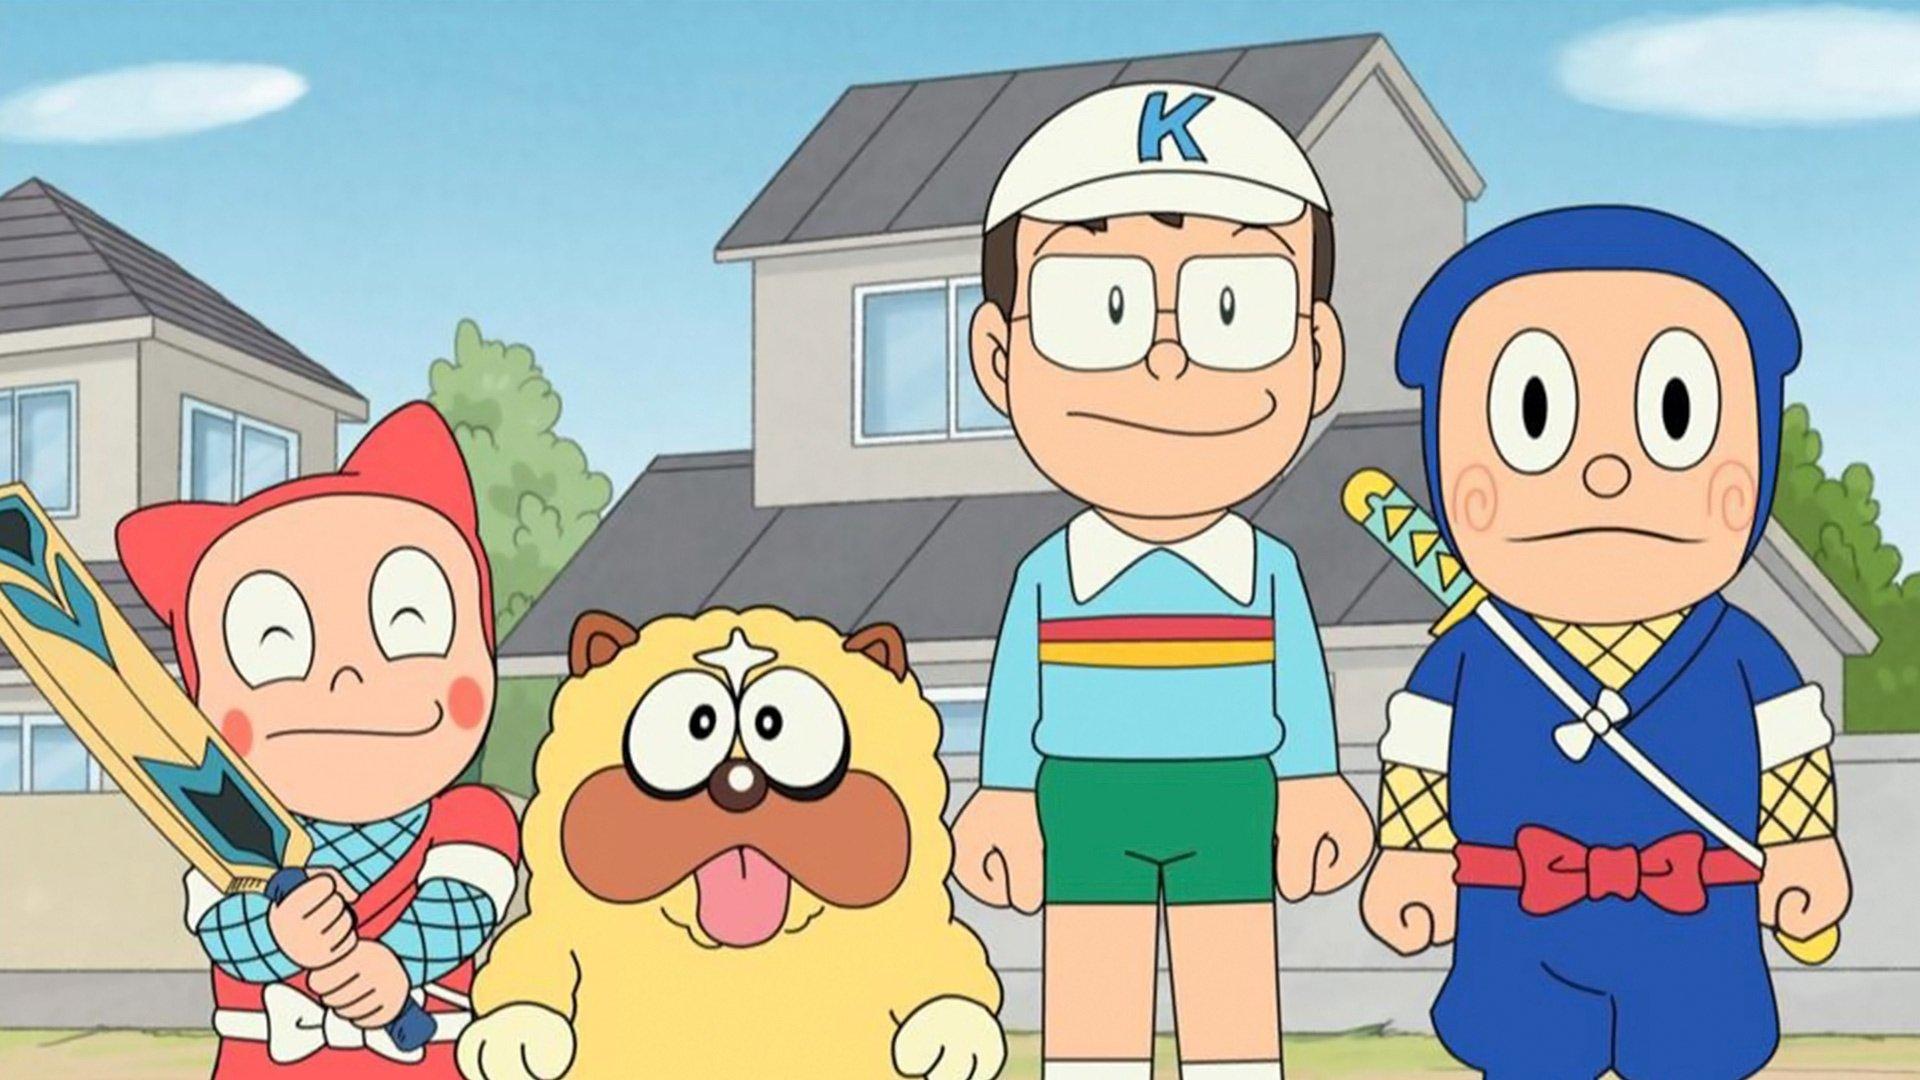 Film kartun masa kecil, film kartun terbaik, film animasi terbaik, film kartun Indonesia